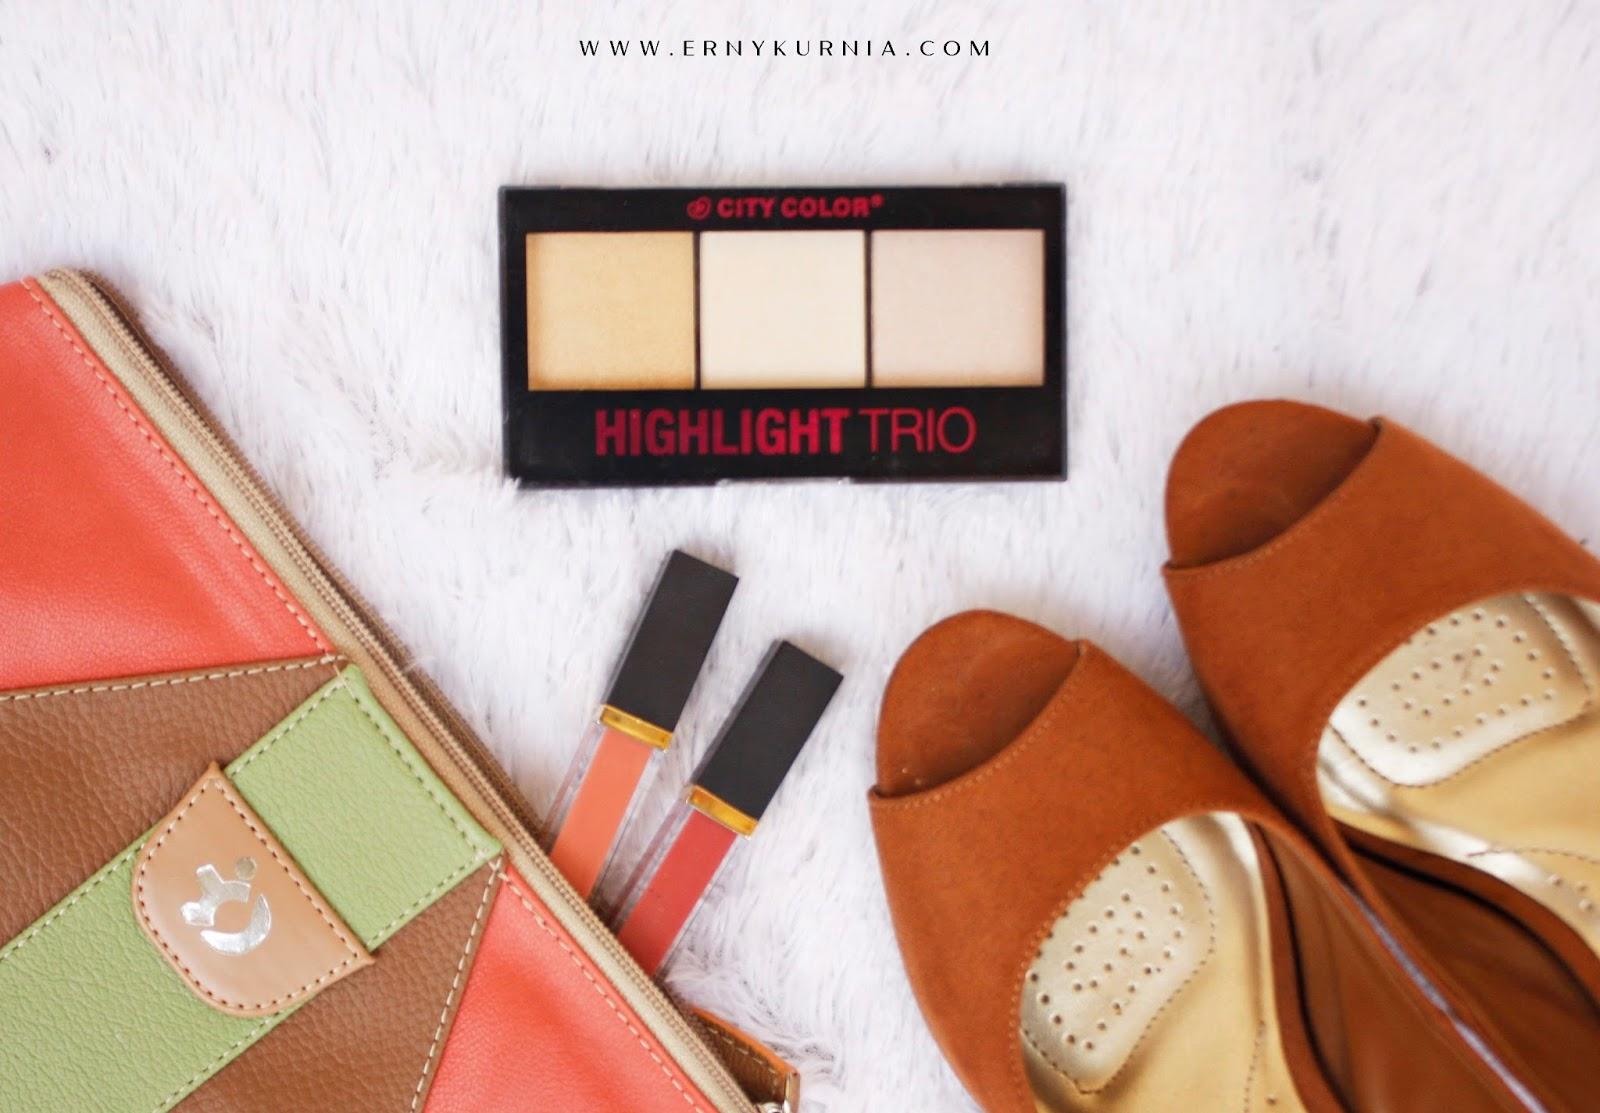 City Color Trio Highlighter, Erny Kurnia, Erny Kurnia Review, Review Highlighter, Highlighter murah,